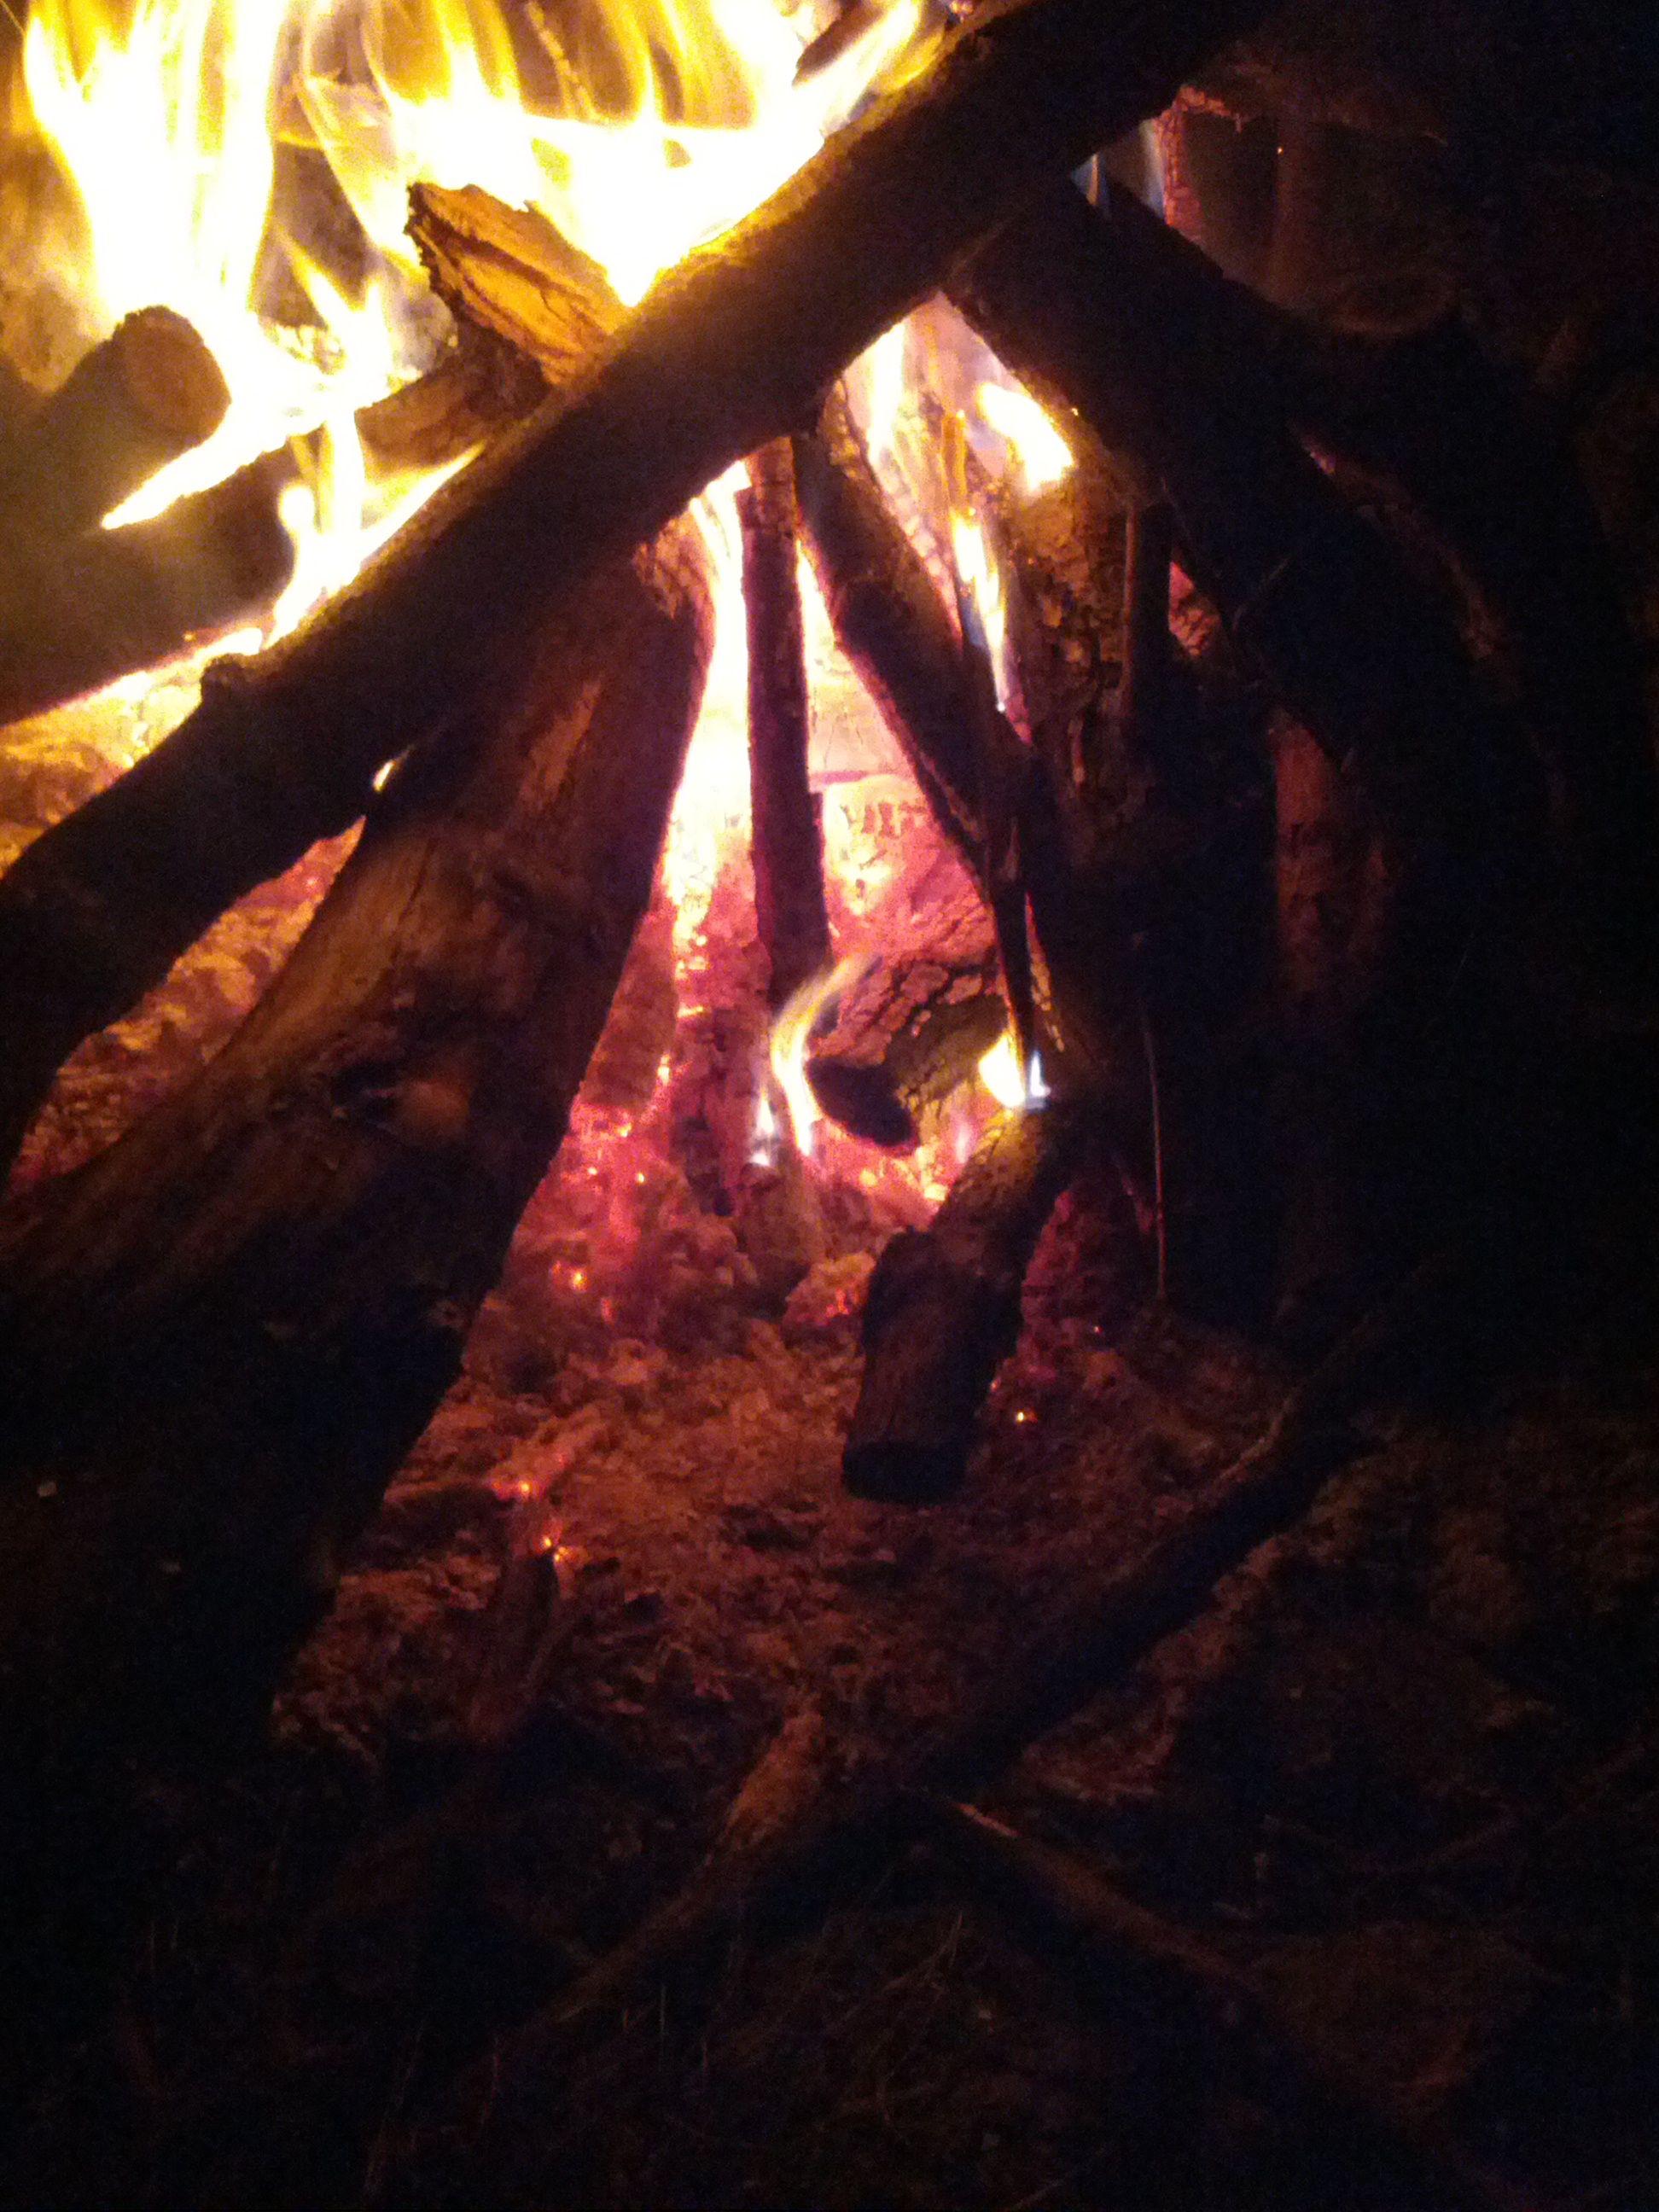 Bonfire at my aunt Joyce's house #bonfire #camp #fire #night #amateur #photography